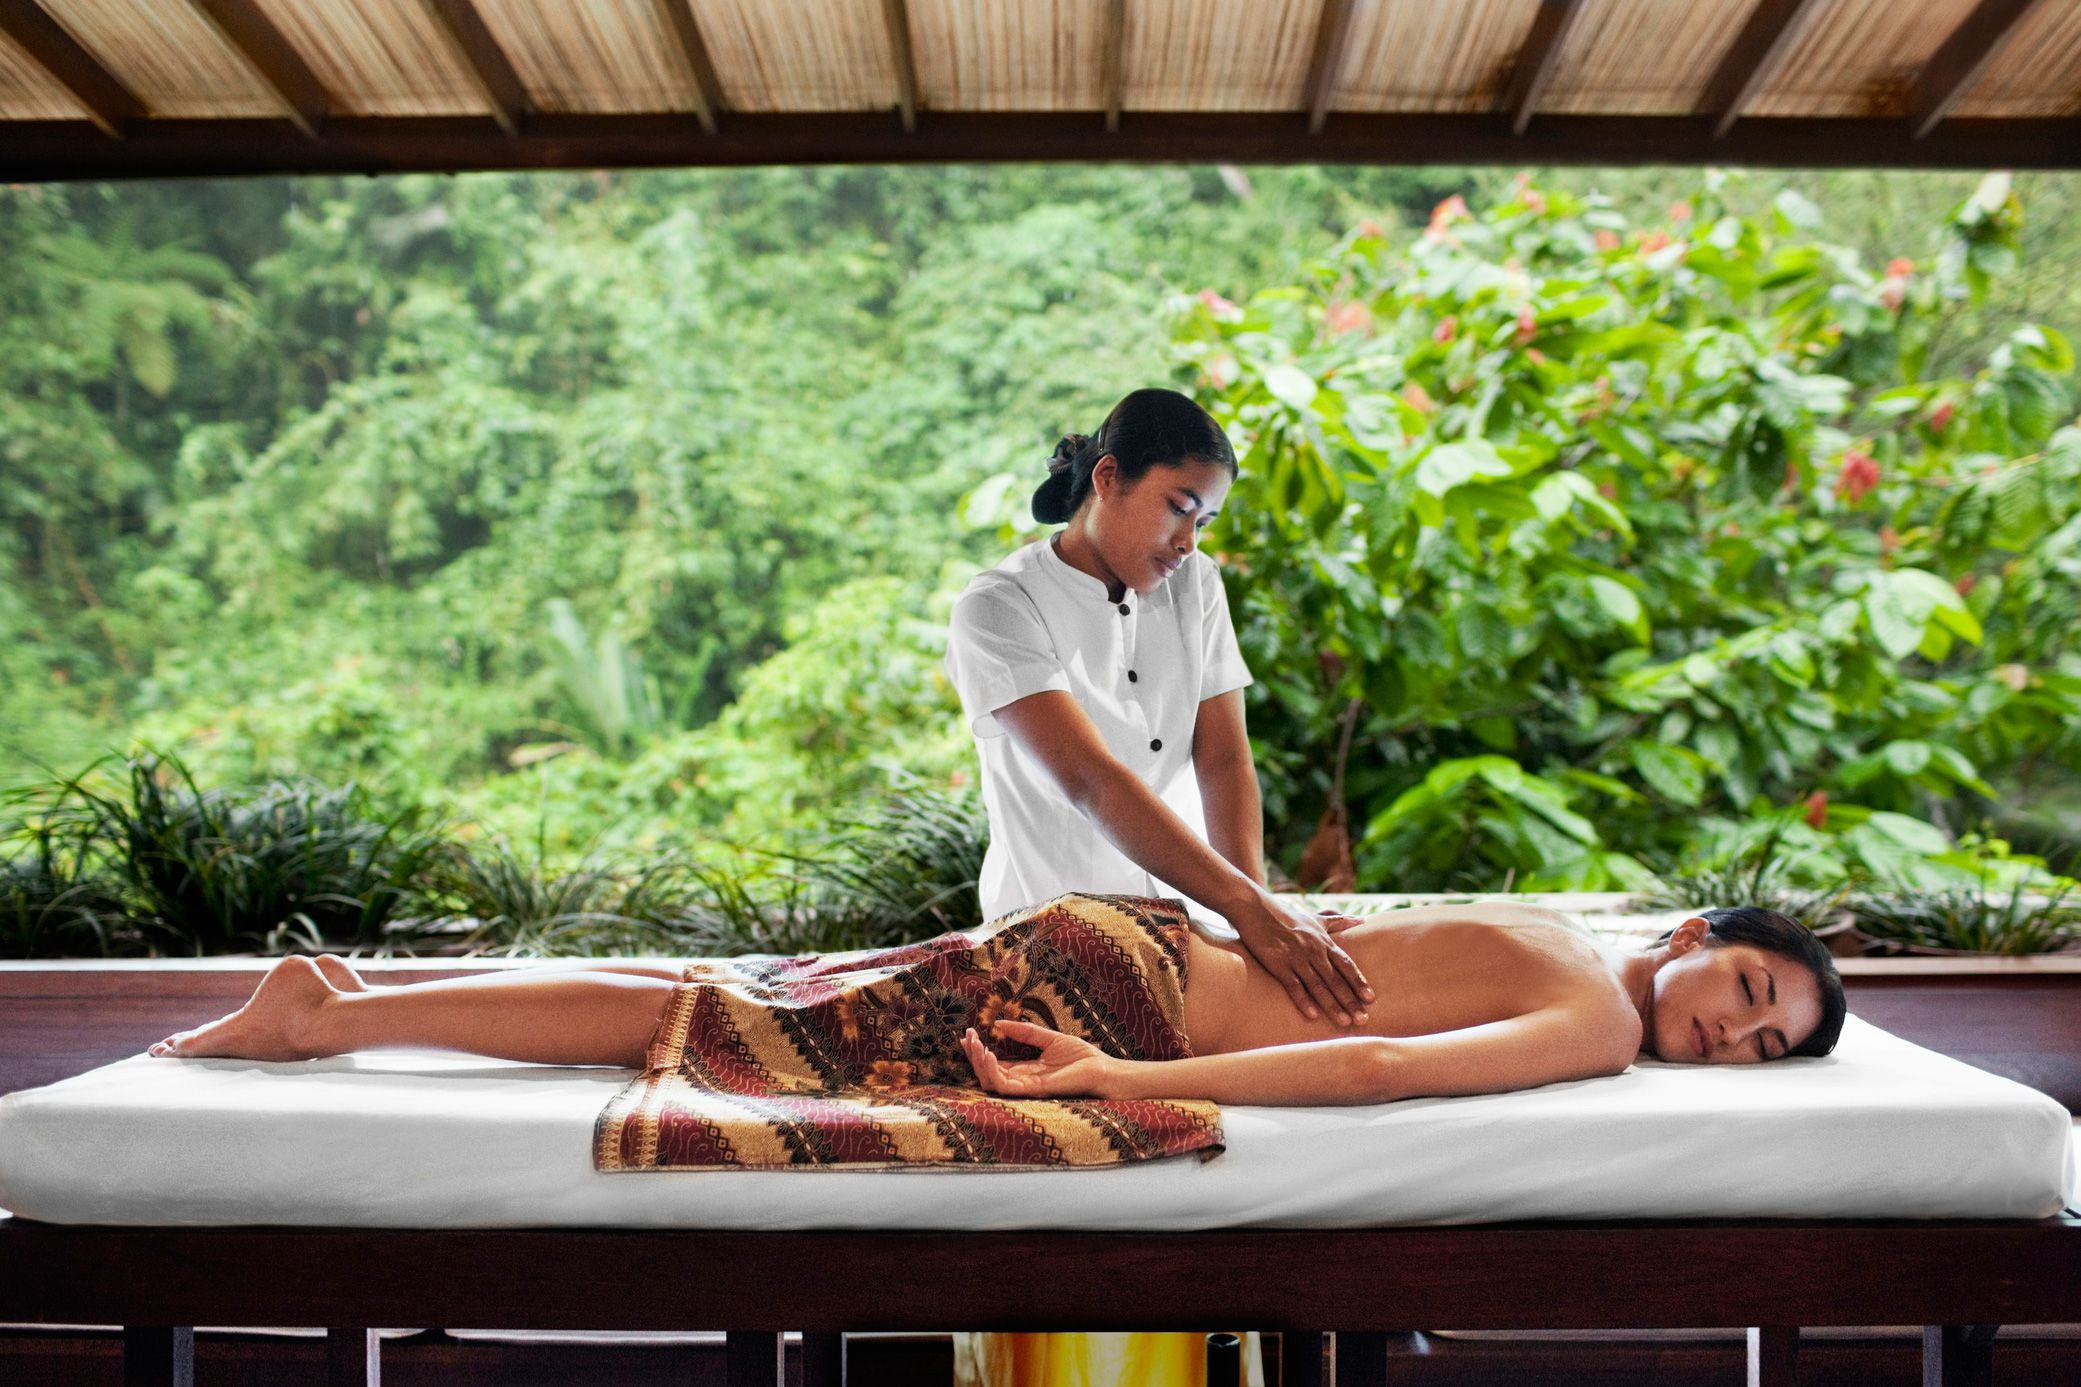 Full Body Massage Types And Misunderstandings